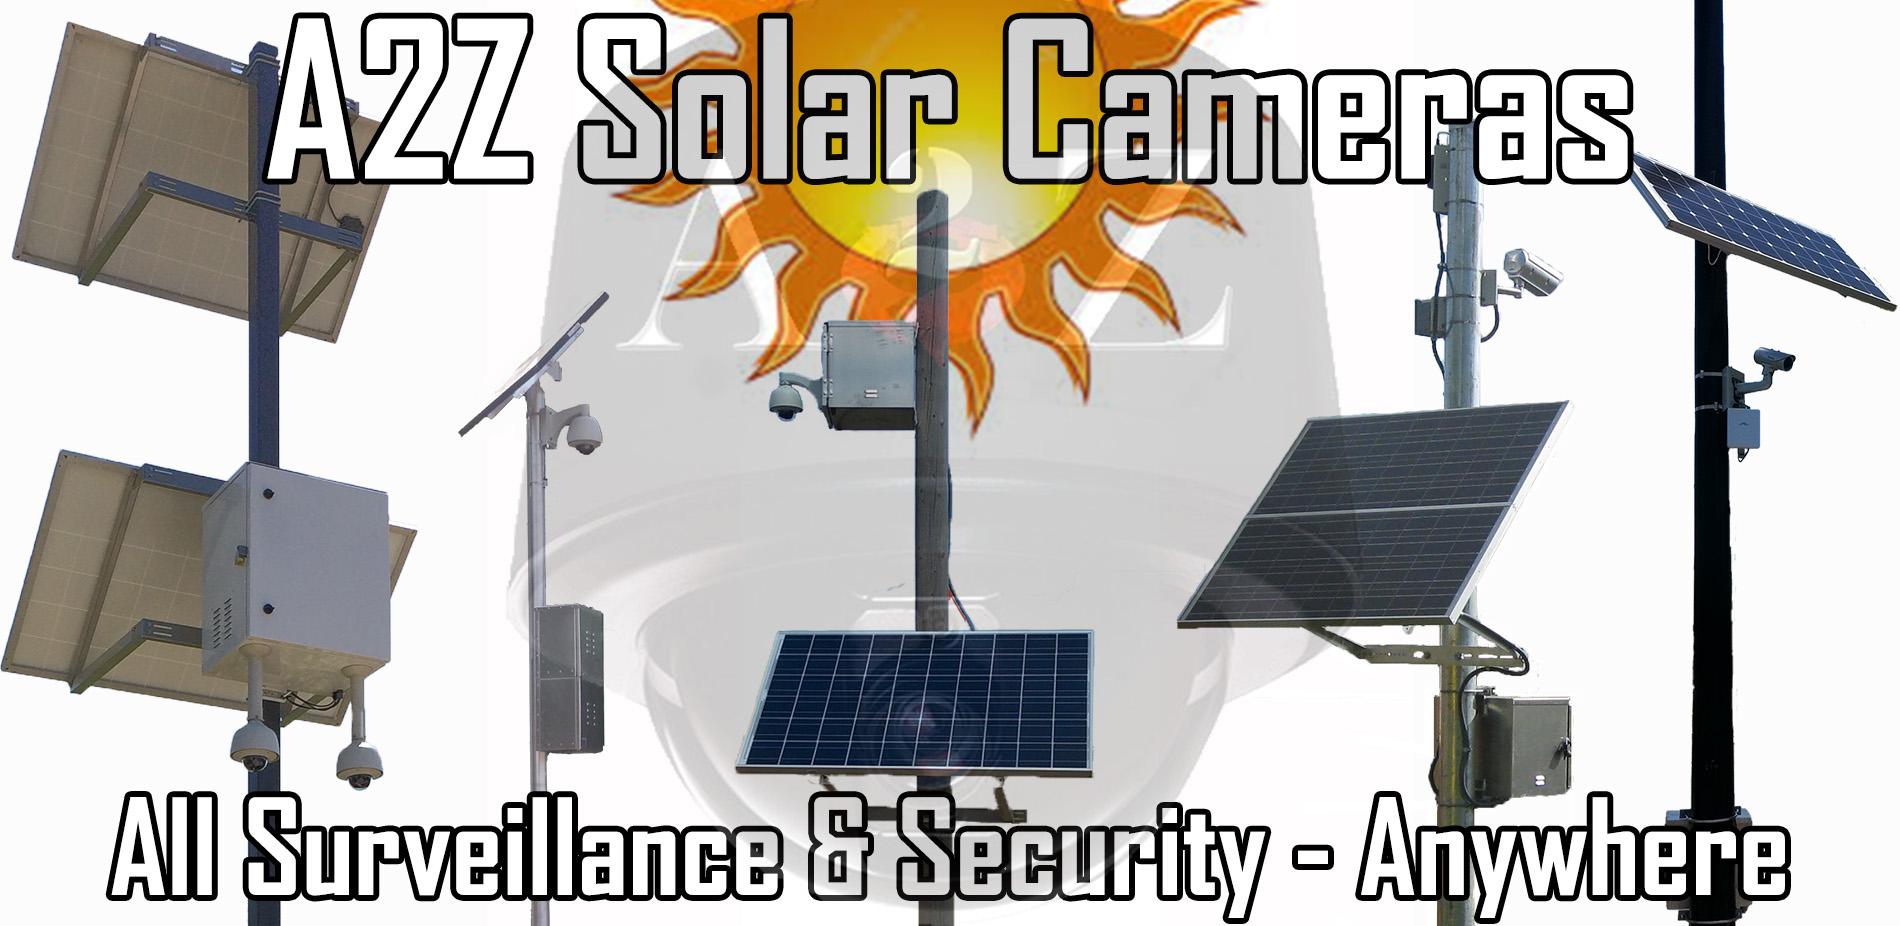 a2z-ss-solar-cameras-systems-banner.jpg